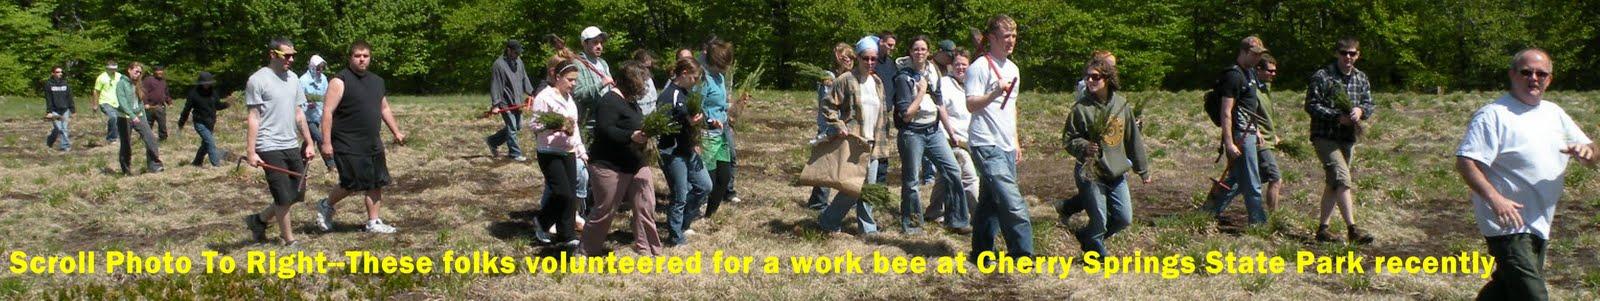 http://2.bp.blogspot.com/_Ah1YLDg8Hfg/S_h6dyUo-wI/AAAAAAAAOg8/SAUmmzWQxM0/s1600/Cherry+Springs++work+bee+2.jpg